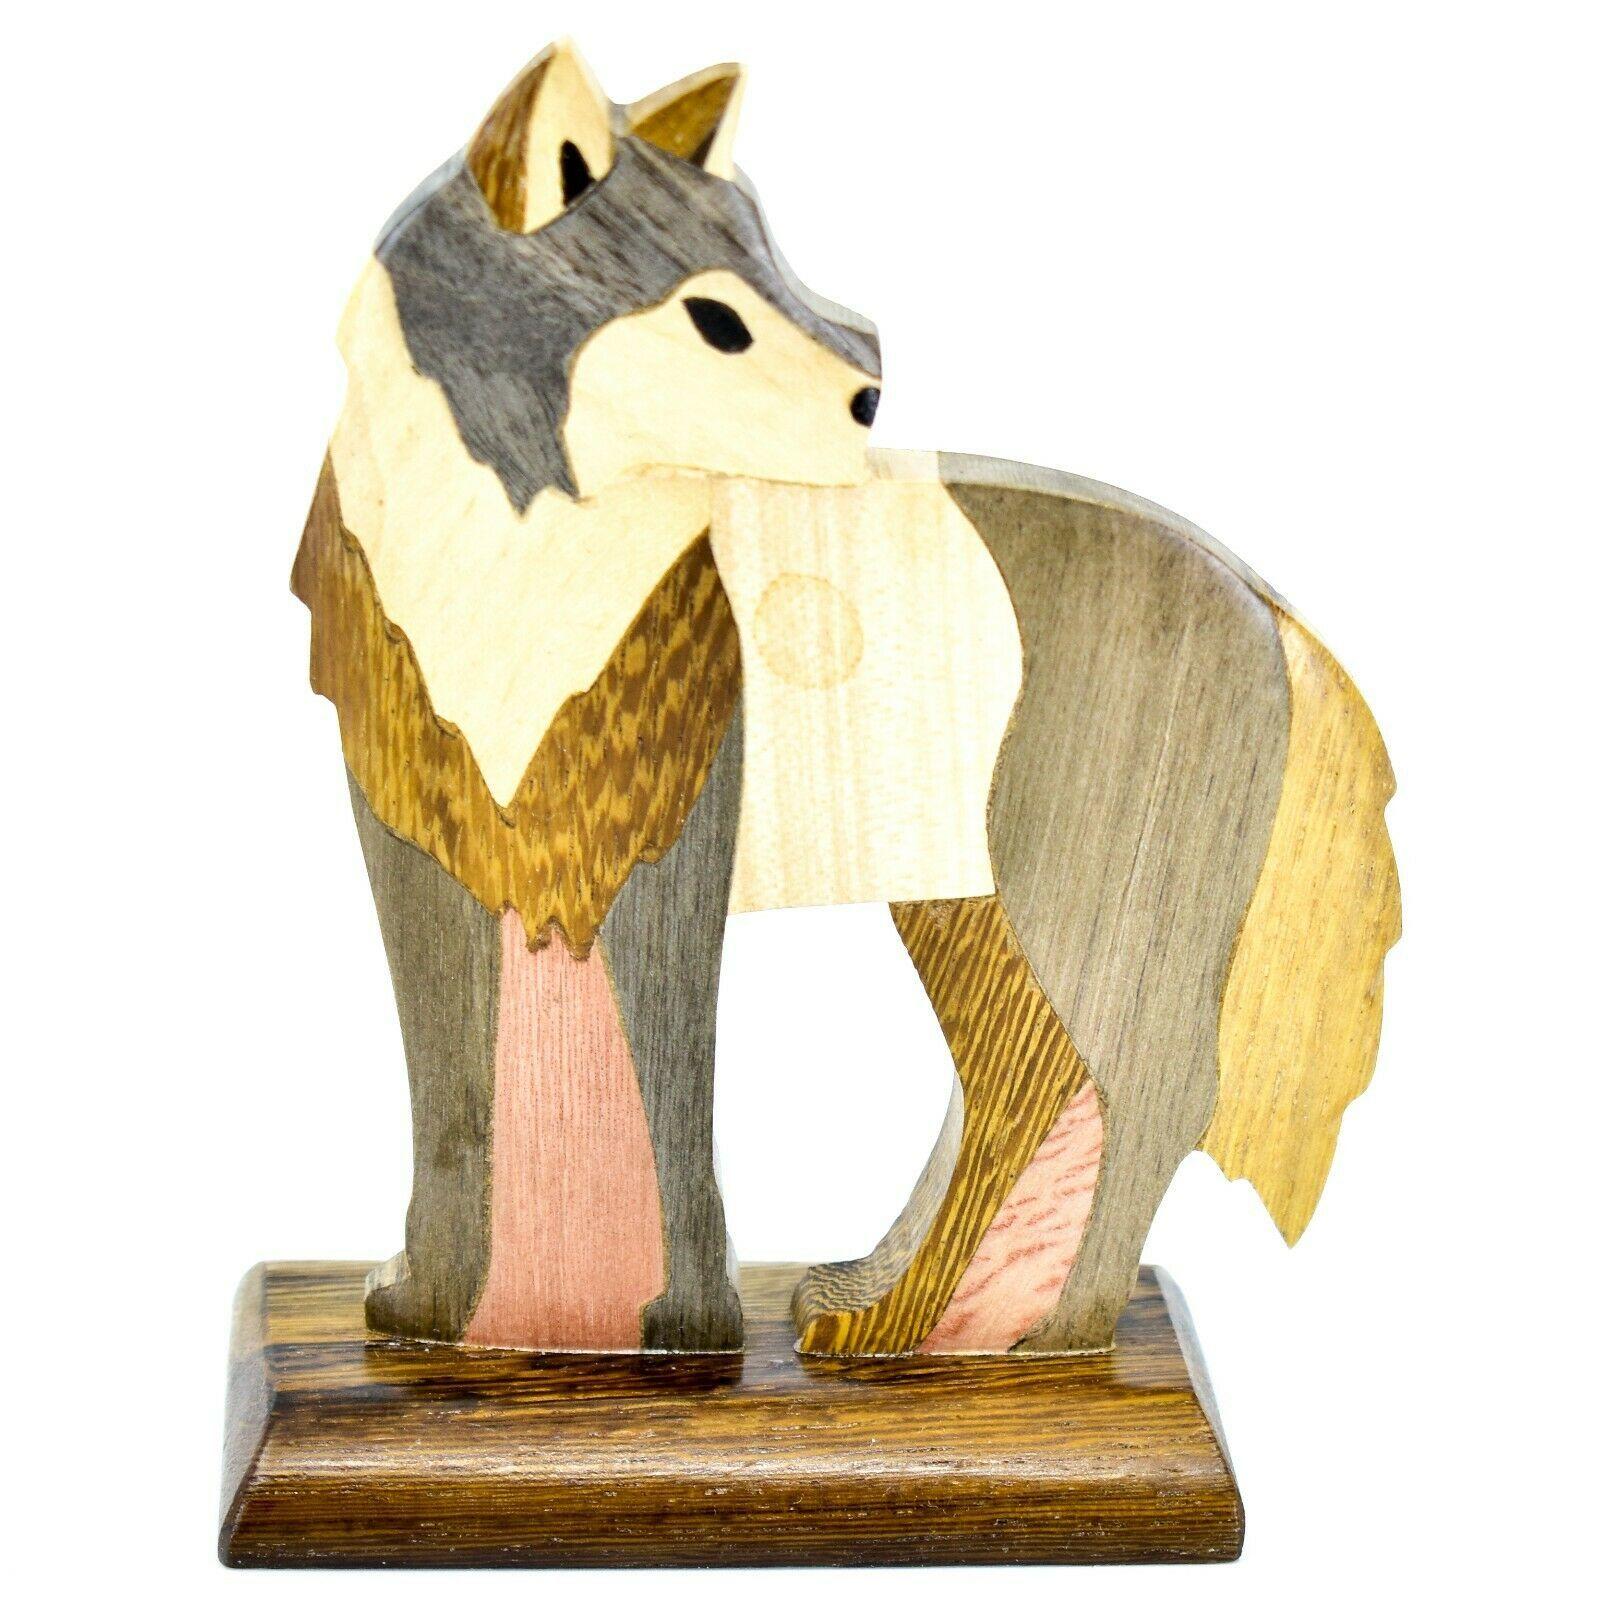 Northwoods Handmade Wooden Parquetry Standing Wolf Sculpture Figurine